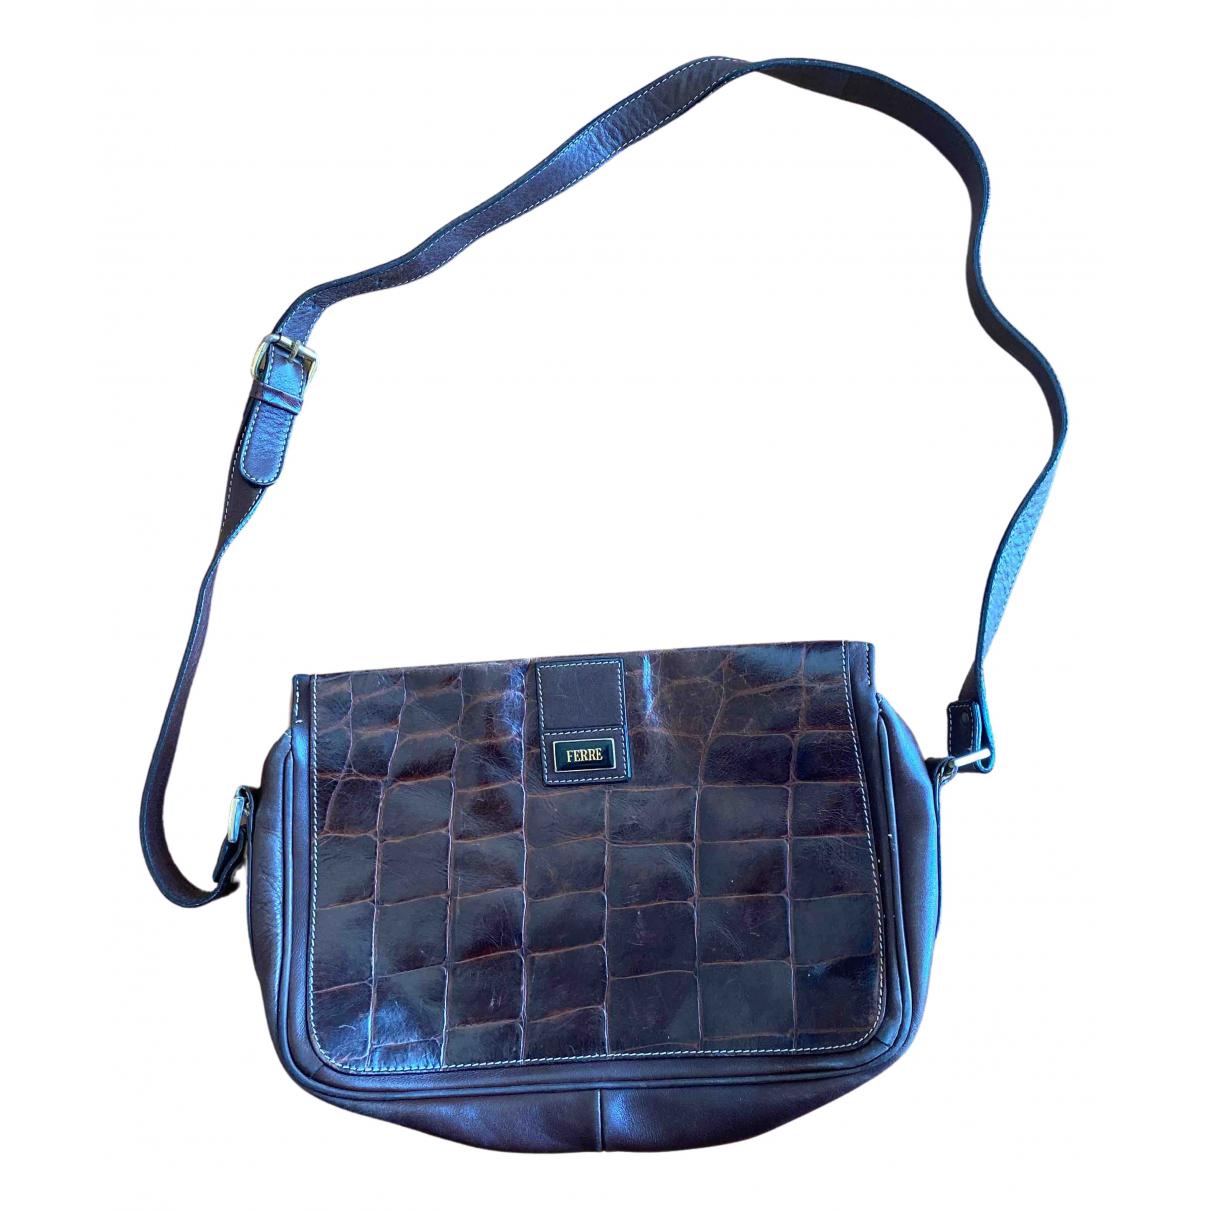 Gianfranco Ferré N Brown Leather handbag for Women N